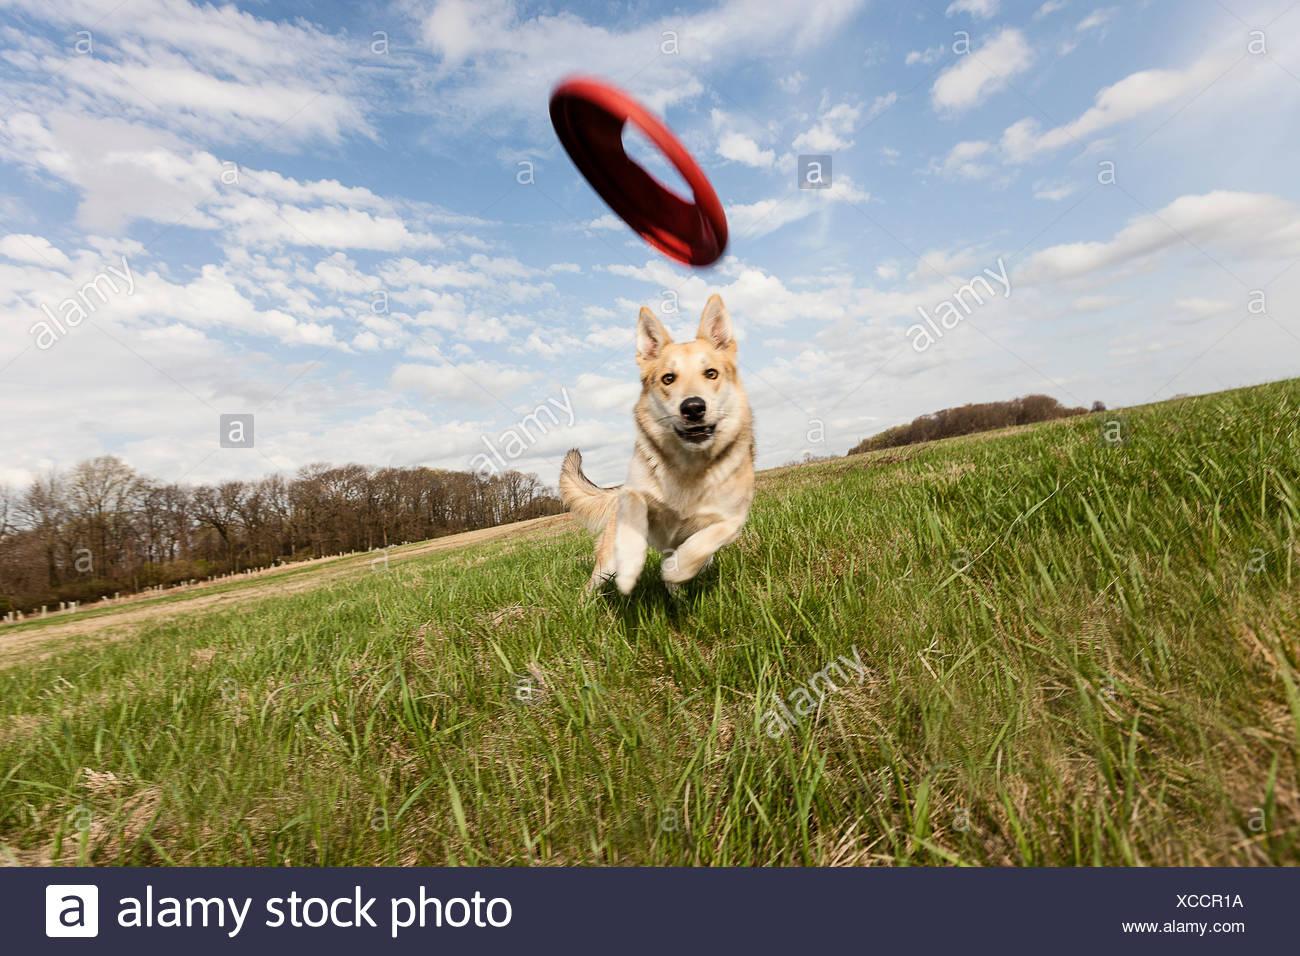 Alsatian dog running through field to catch frisbee - Stock Image